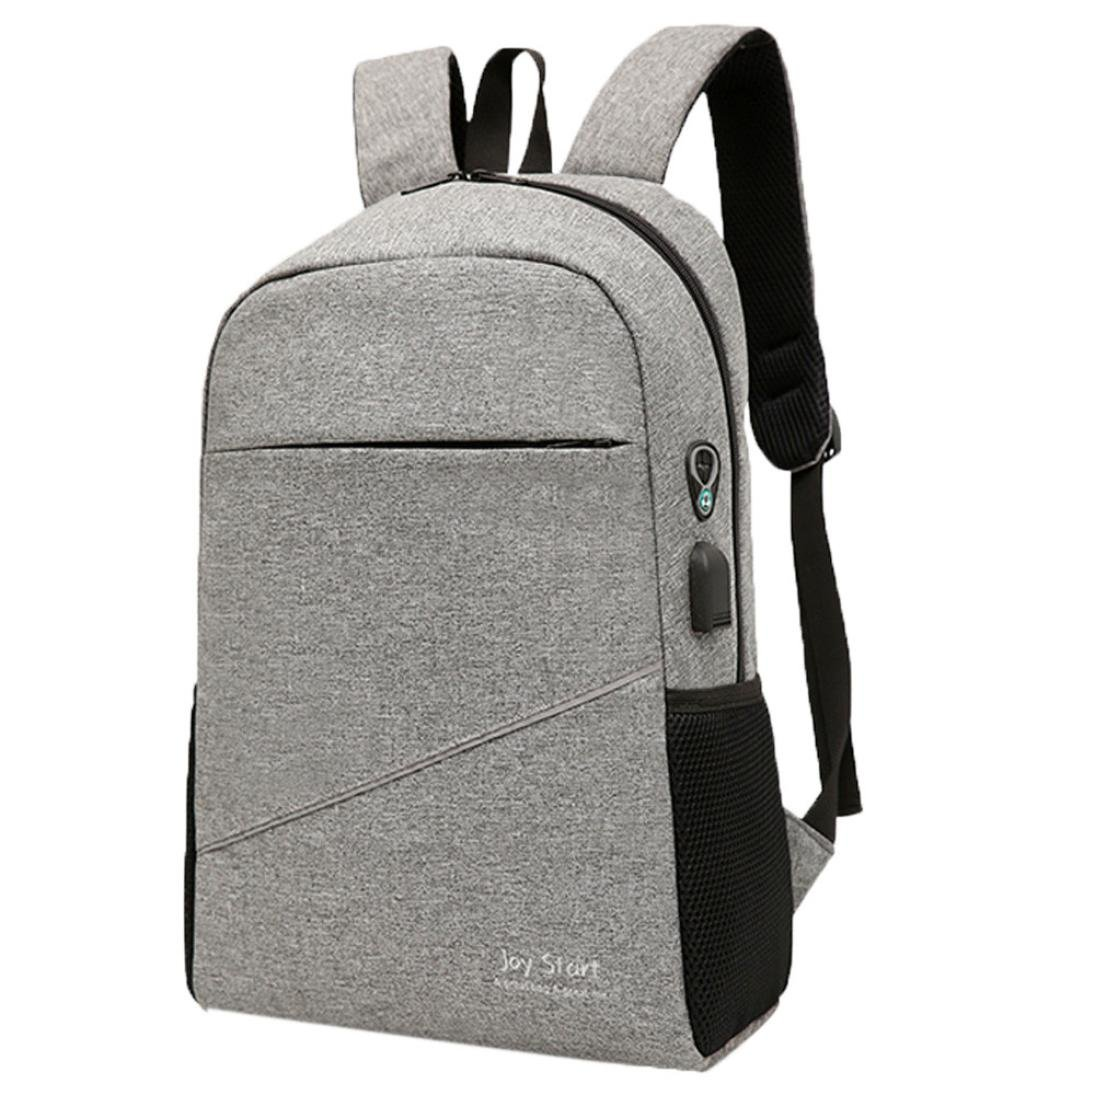 School Book Bags for Men Boys,Jchen(TM) Clearance Sale! Men Backpacks Travel Bag Women School Bag Fashion Travel School Bags Bag Packs (Gray)